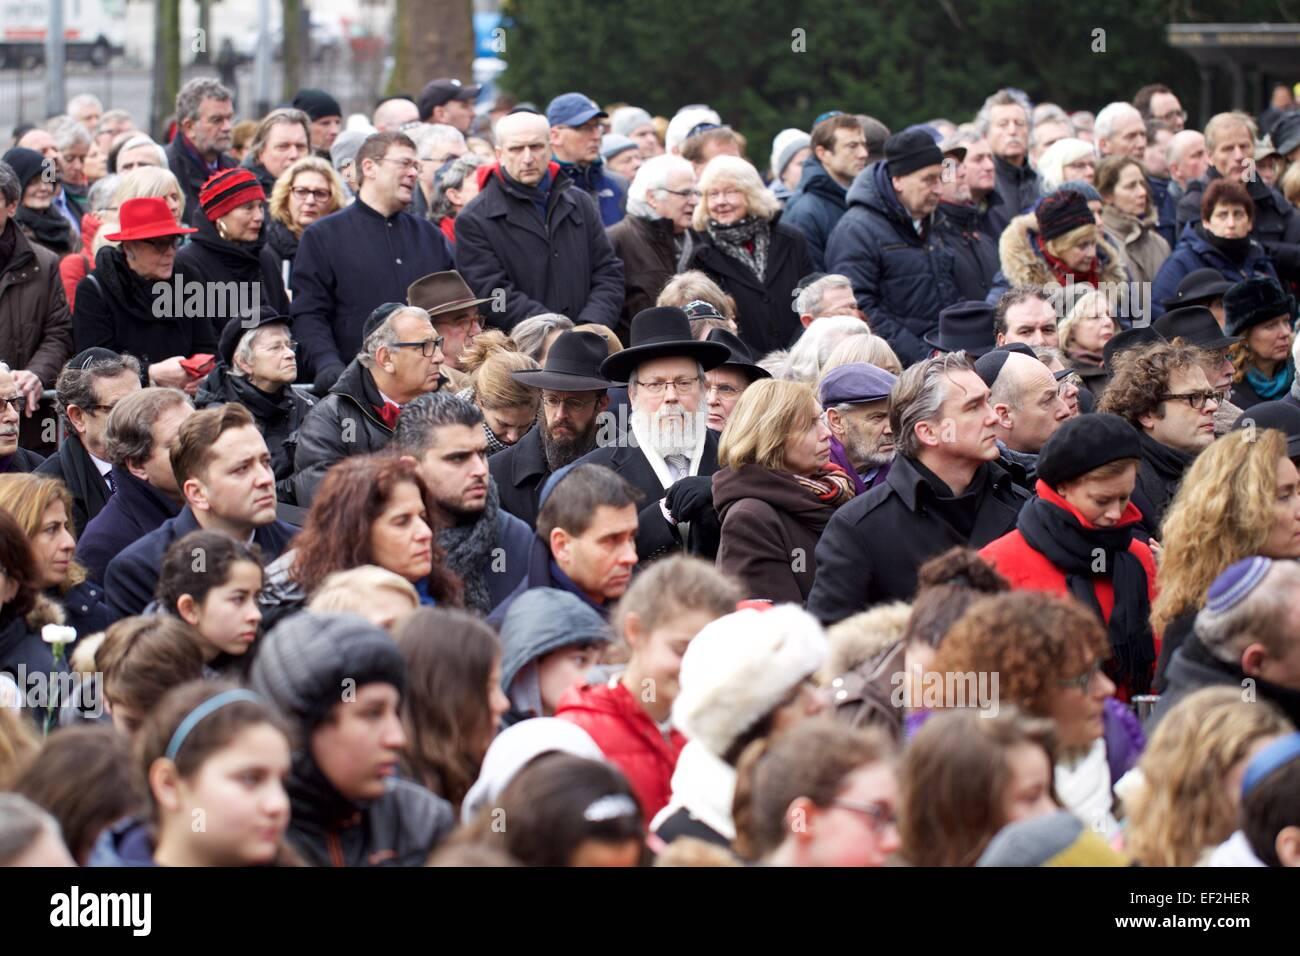 Amsterdam, Netherlands. 25th Jan, 2015. Dutch people attend a silent march in Amsterdam, Netherlands, on Jan. 25, - Stock Image